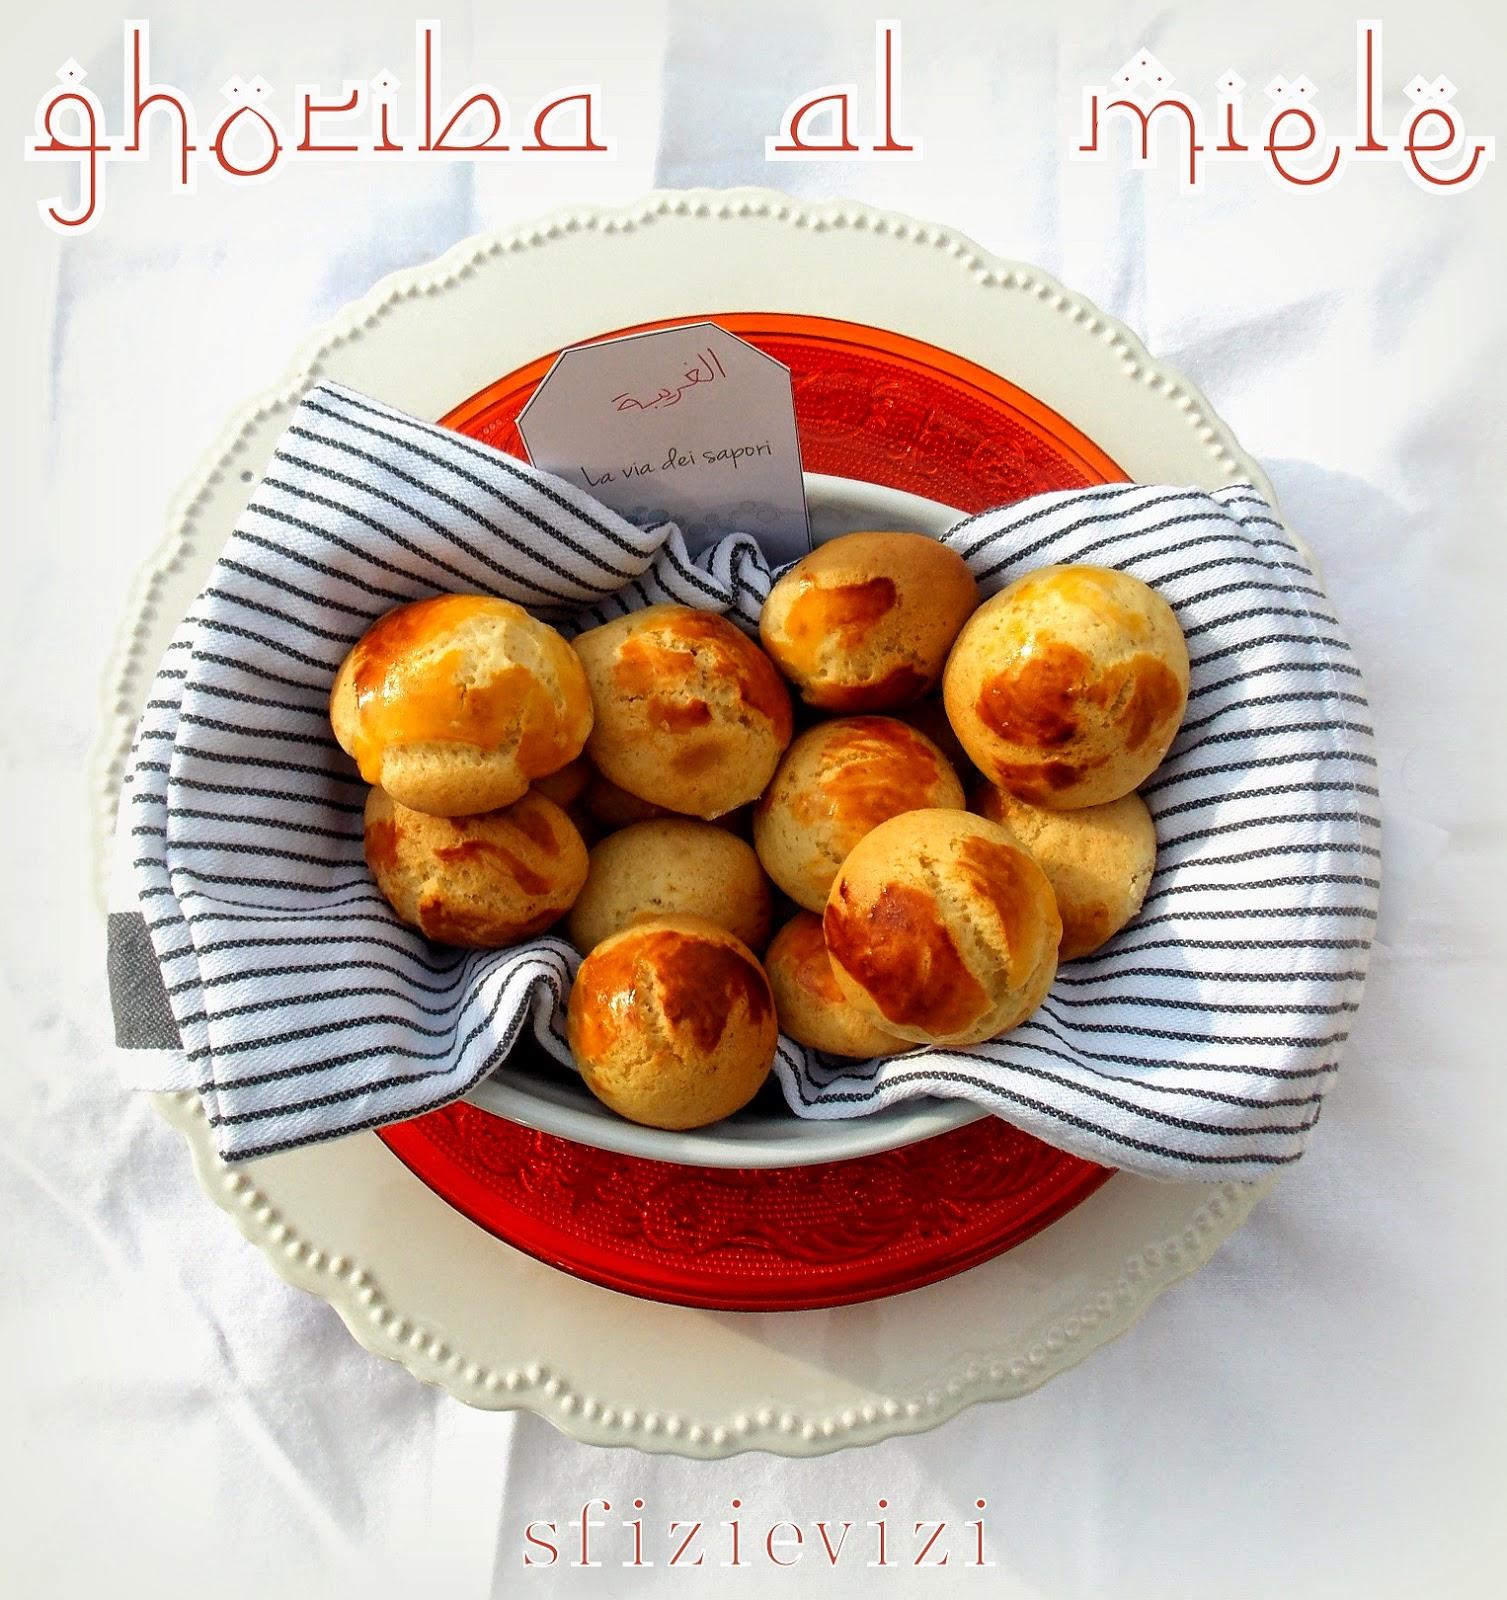 ghoriba dyal 'asal - ghoriba al miele (ricetta con olio d'oliva) per